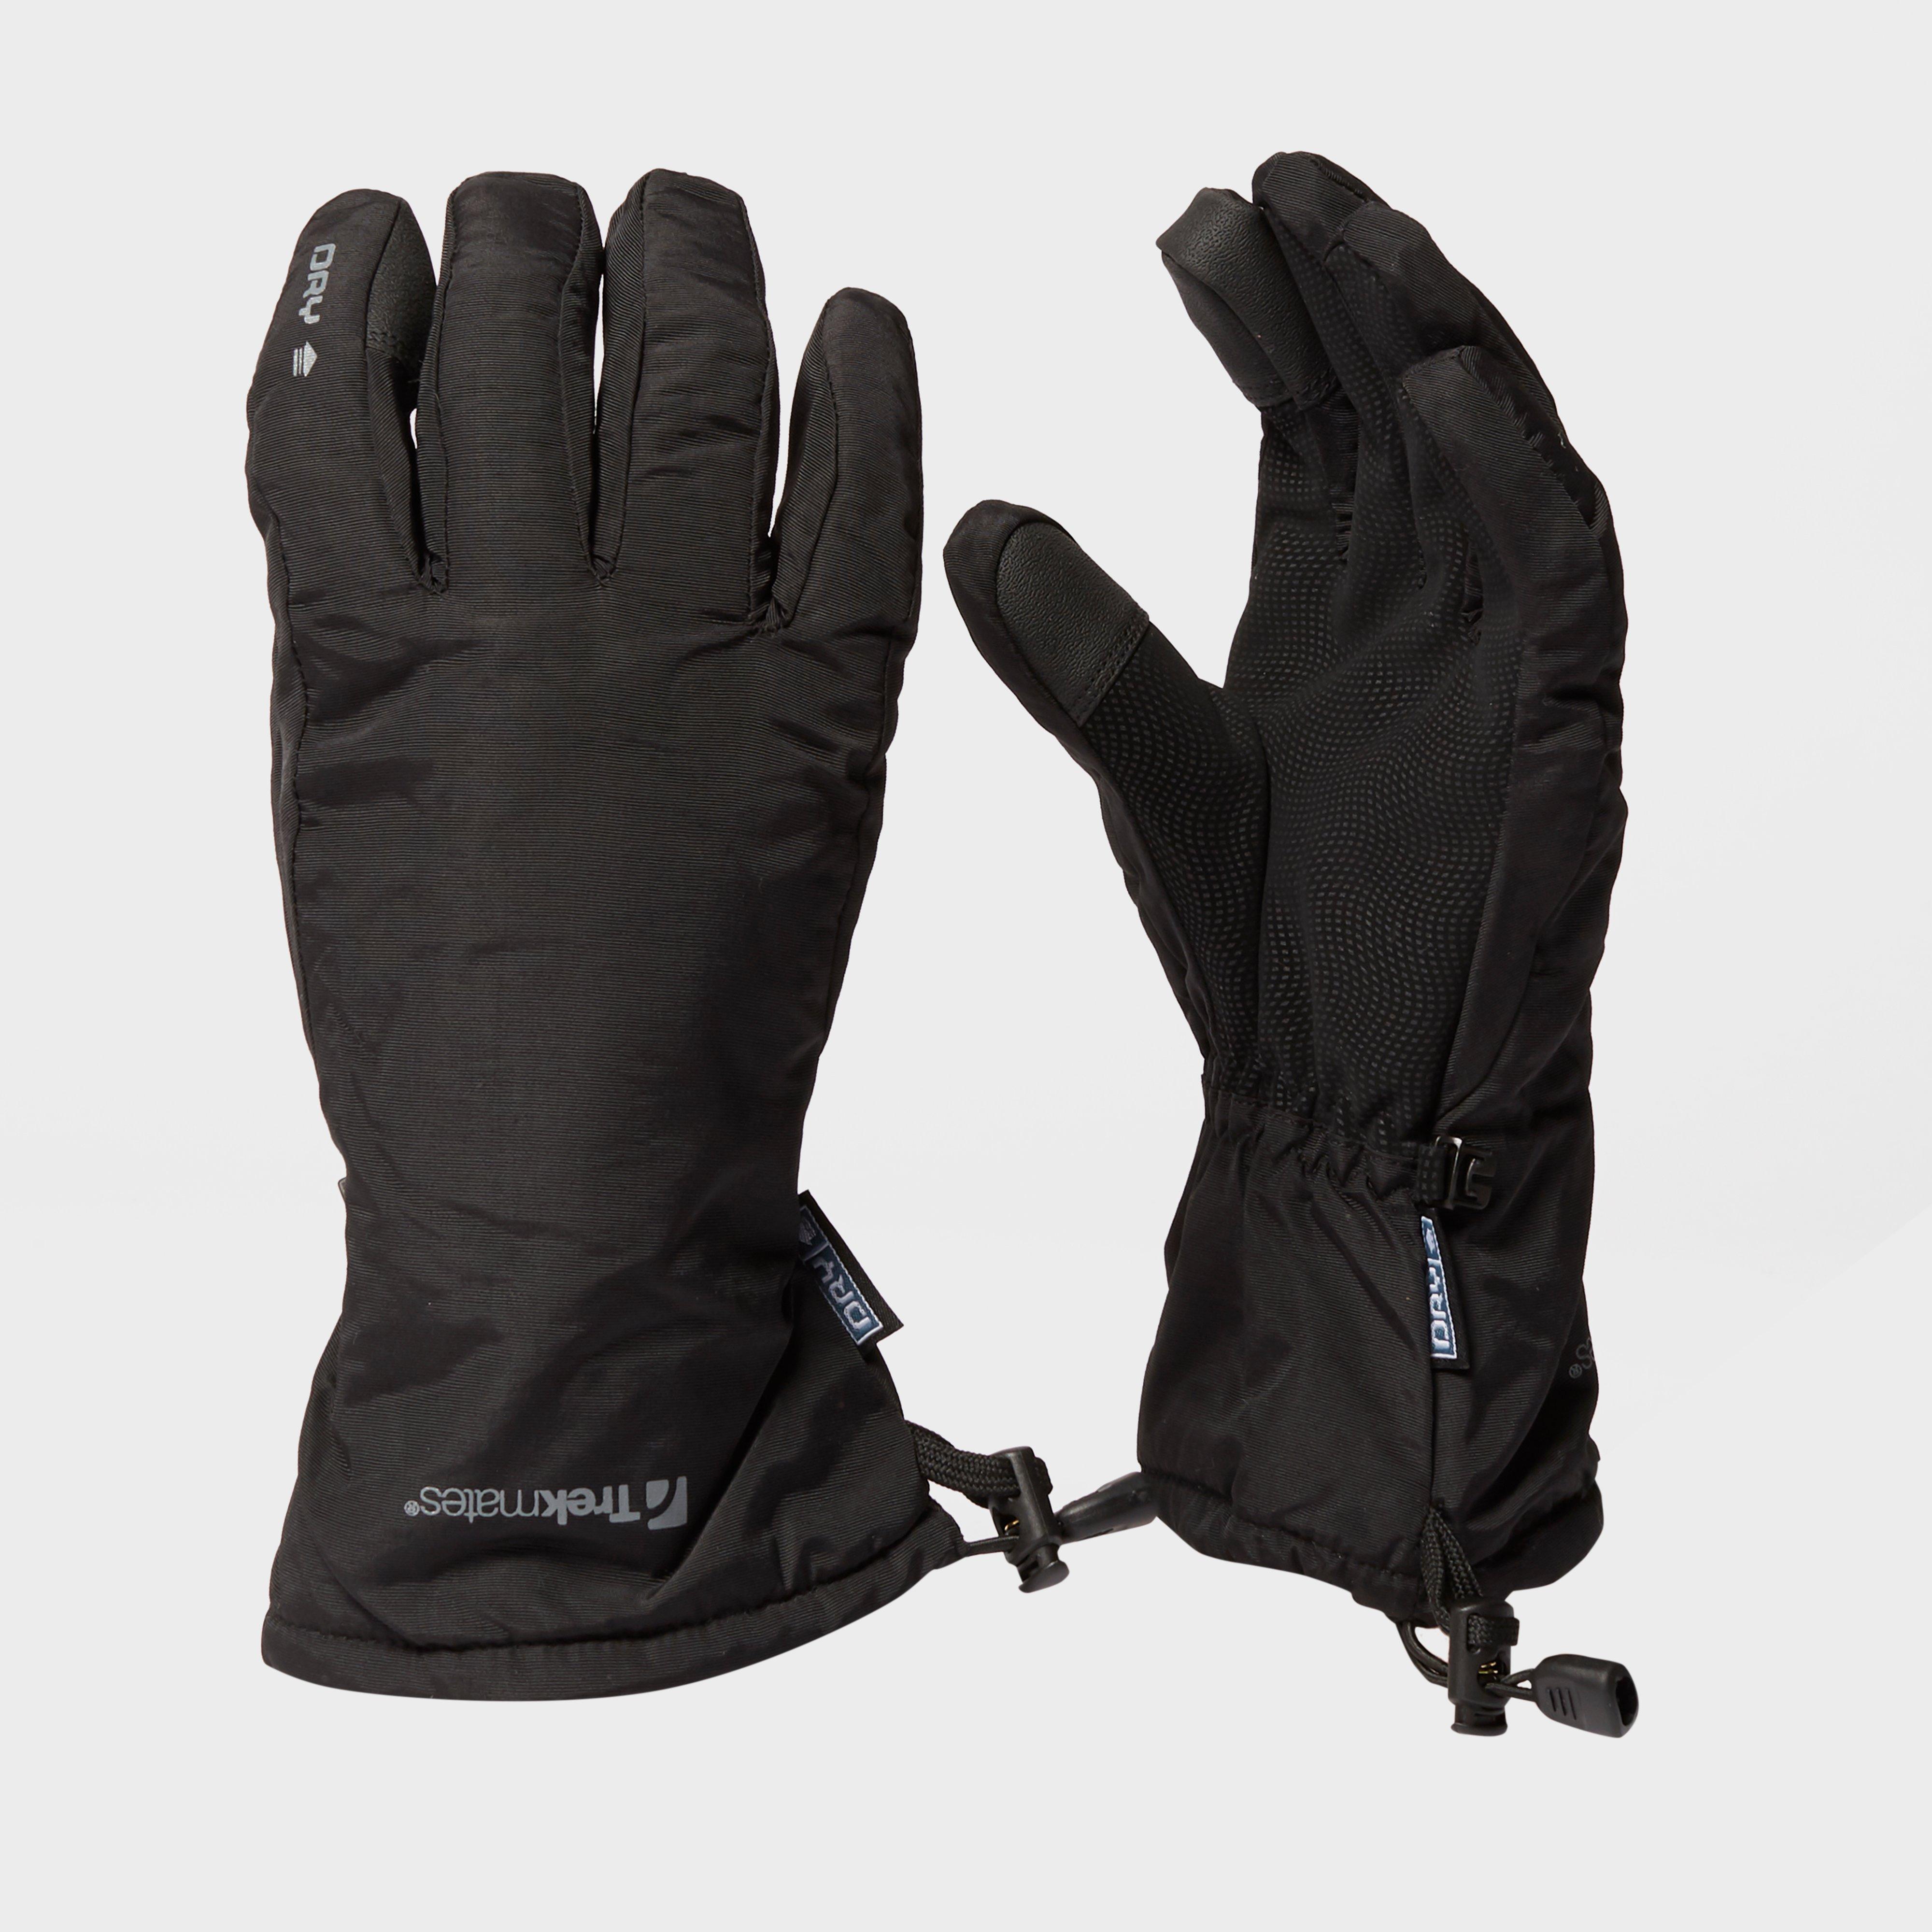 Trekmates Mens Beacon Gloves - Black/blk  Black/blk